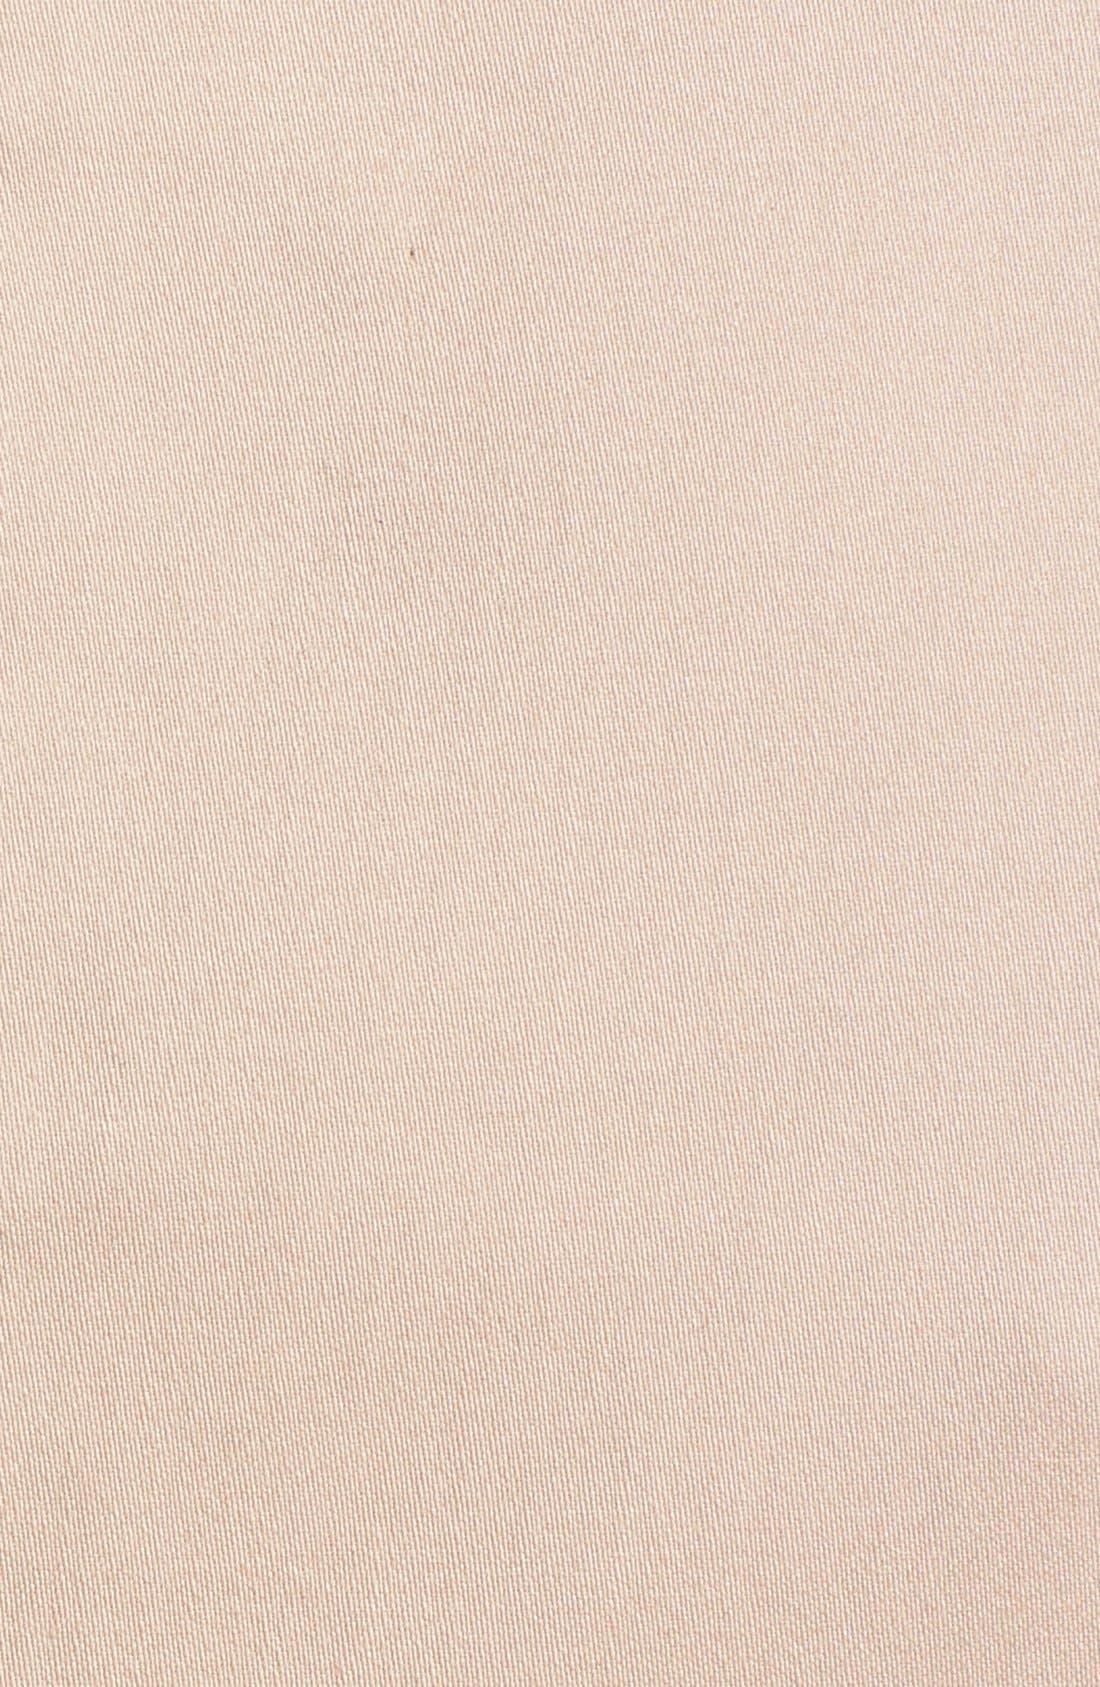 Alternate Image 4  - Ellen Tracy Faux Leather Trim Sleeveless Sheath Dress